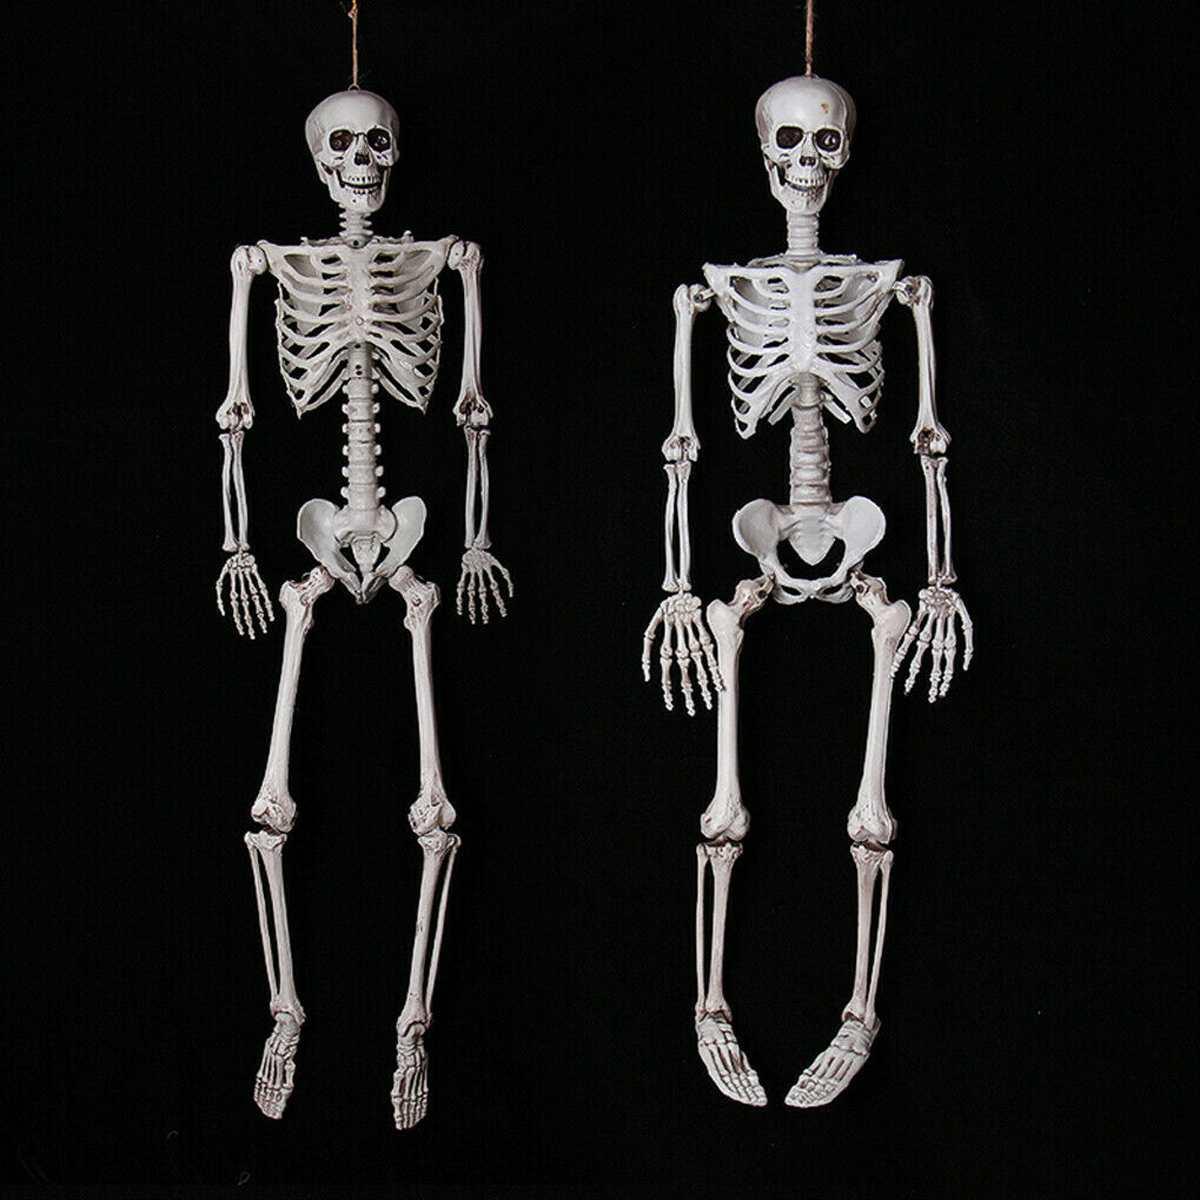 NEW 1/2PCS 90cm Size Simulation Human Skeleton Ornament Halloween Party Bar Haunted House Skeleton Decor Prop